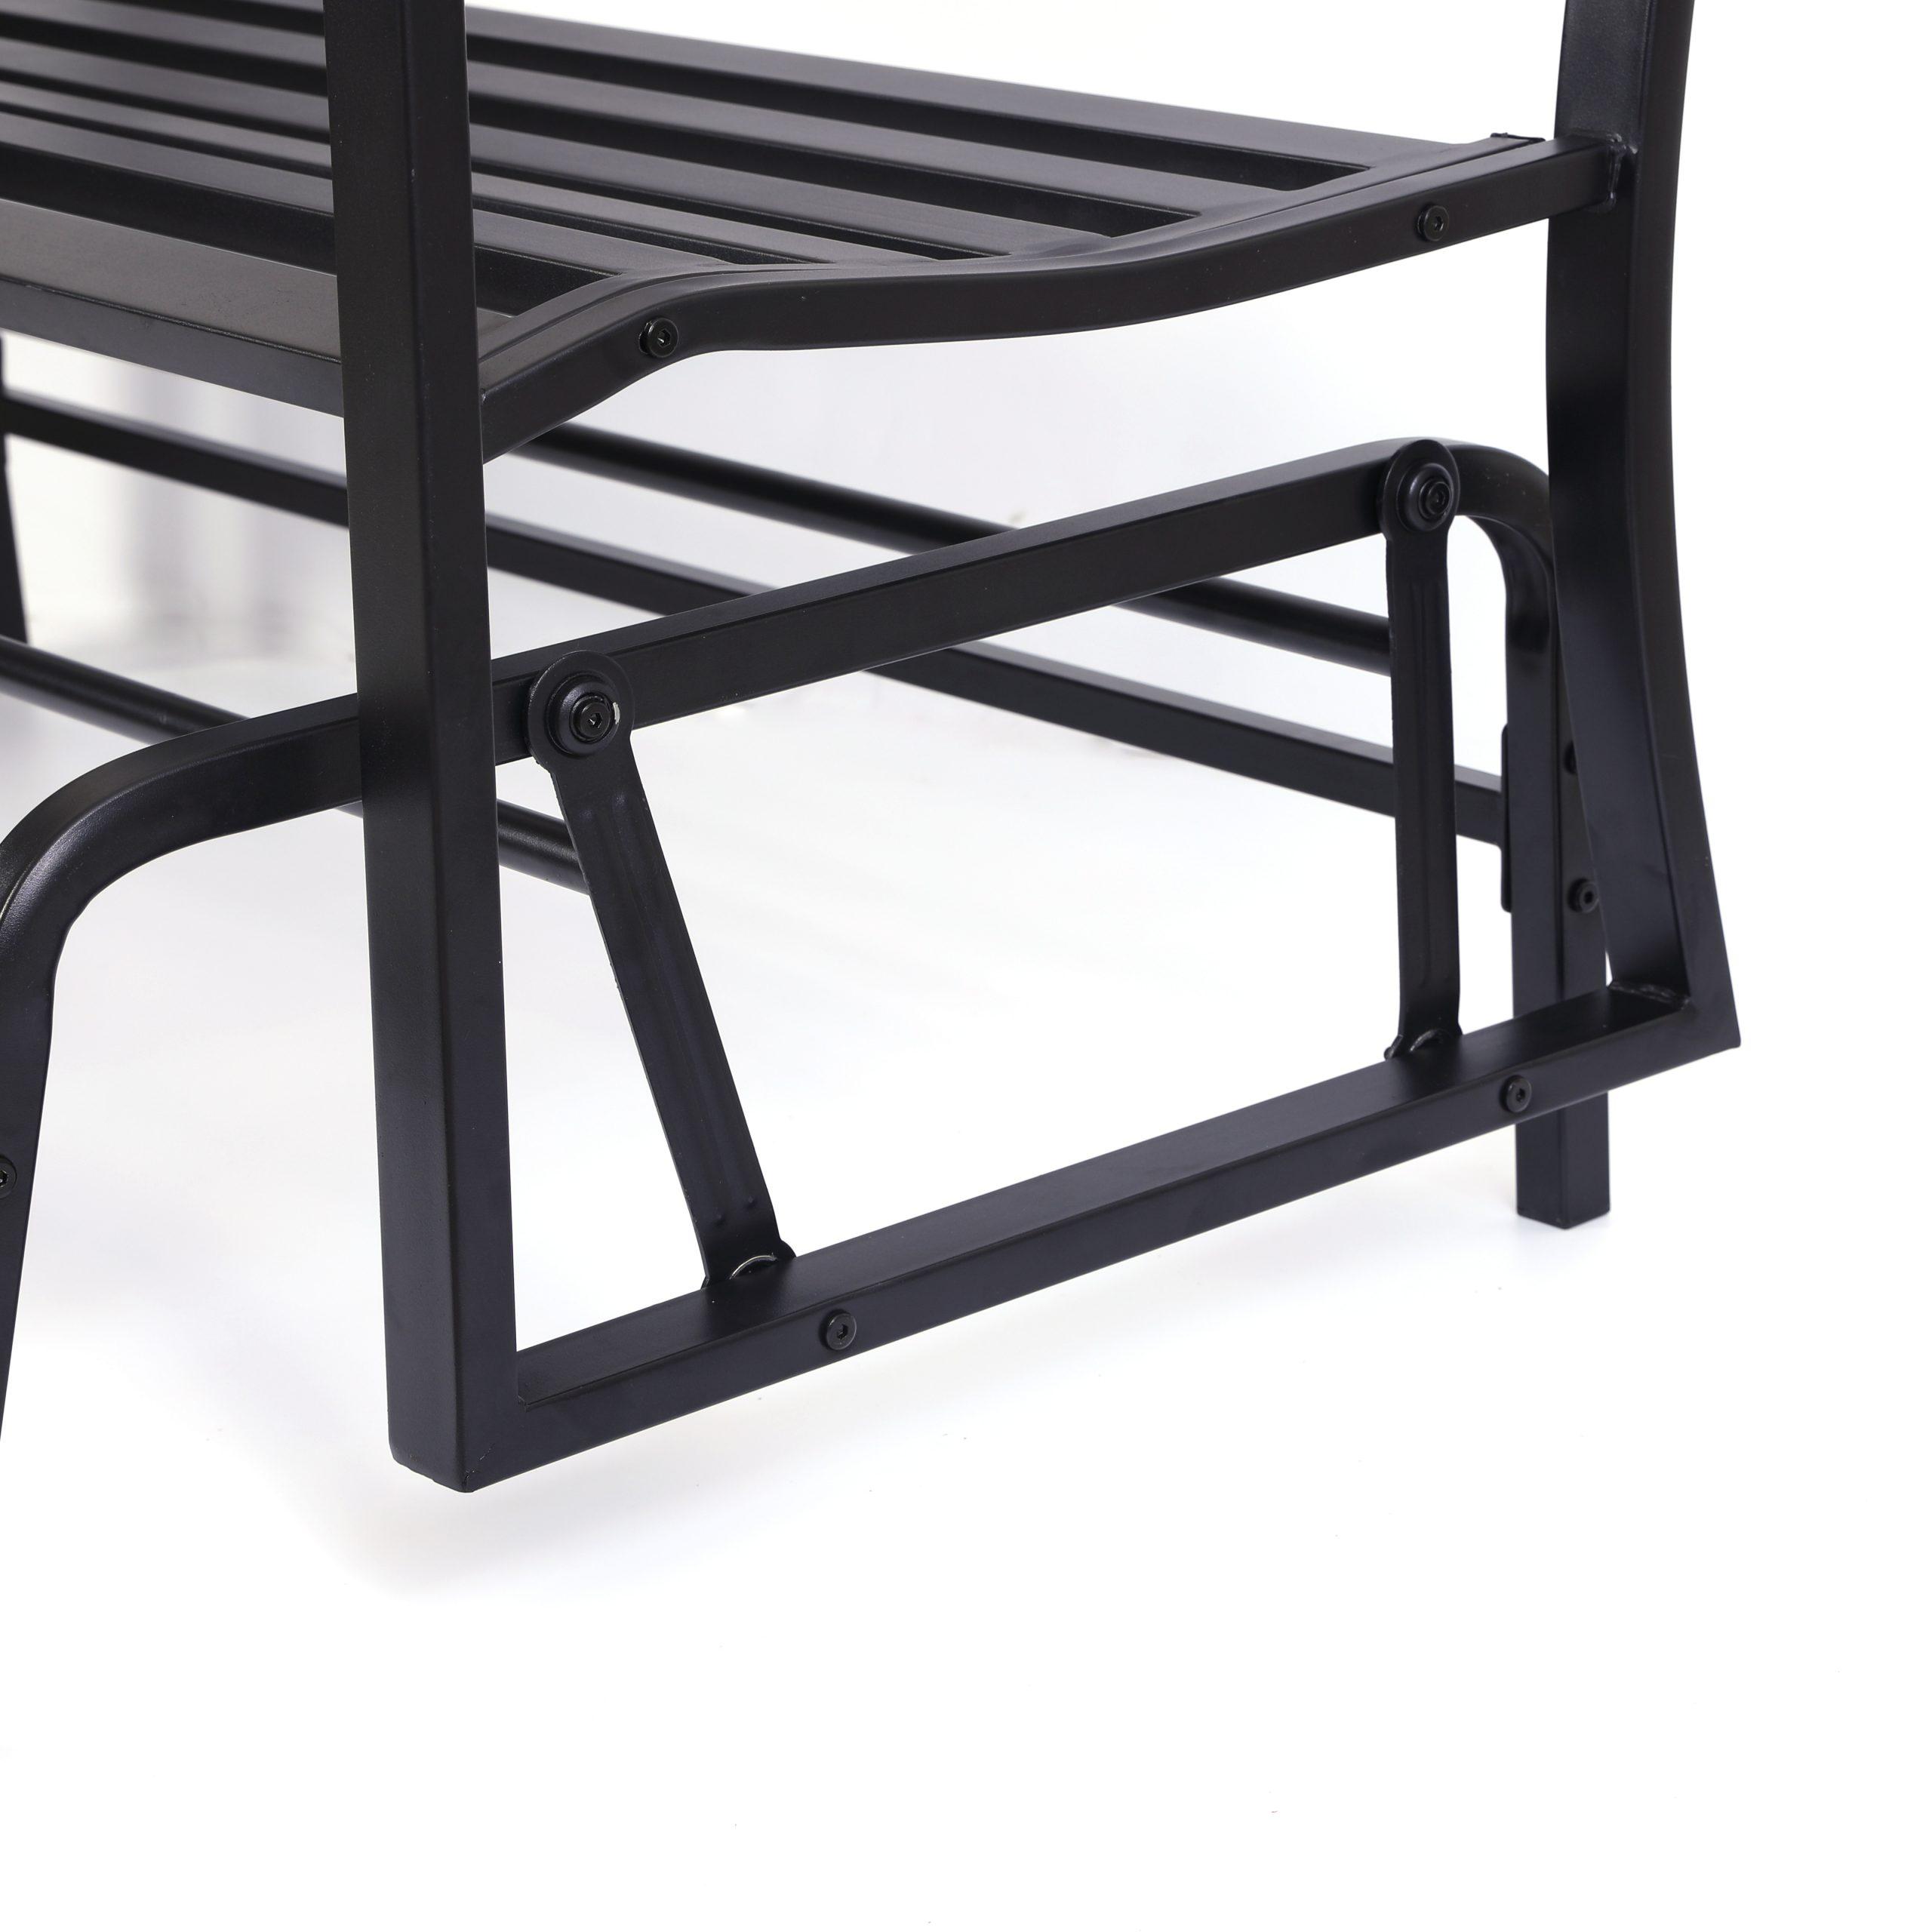 "Black Outdoor Durable Steel Frame Patio Swing Glider Bench Chairs Regarding Preferred Details About Gardenised Black Steel Patio Garden Park Yard 50"" Outdoor Swing Glider Bench (View 21 of 25)"